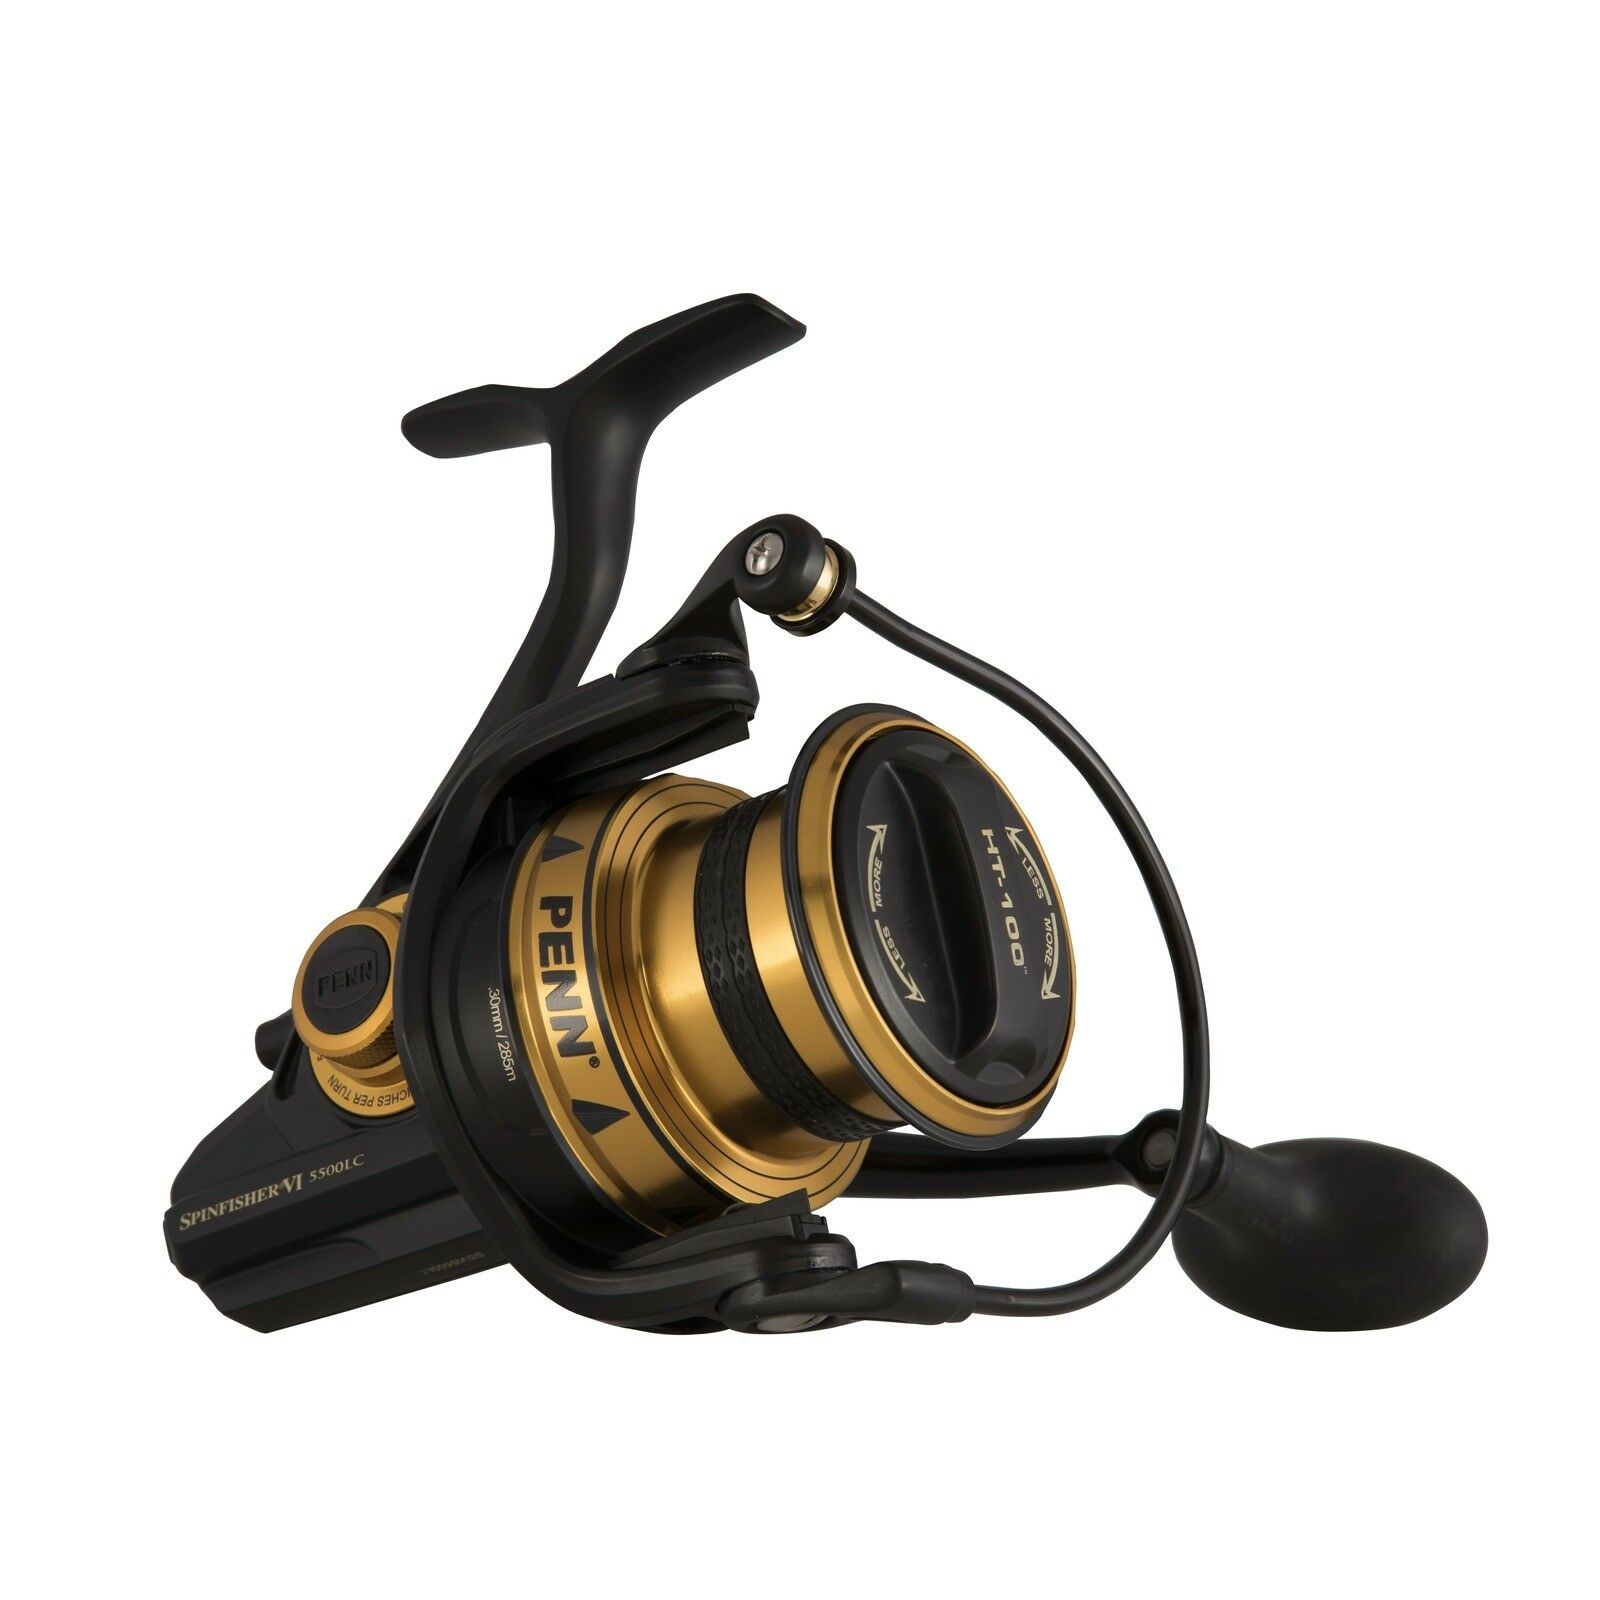 Penn Spinfisher VI SSV 7500 LONG CAST Spinning Fishing Reel SSVI7500LC- NEW 2018